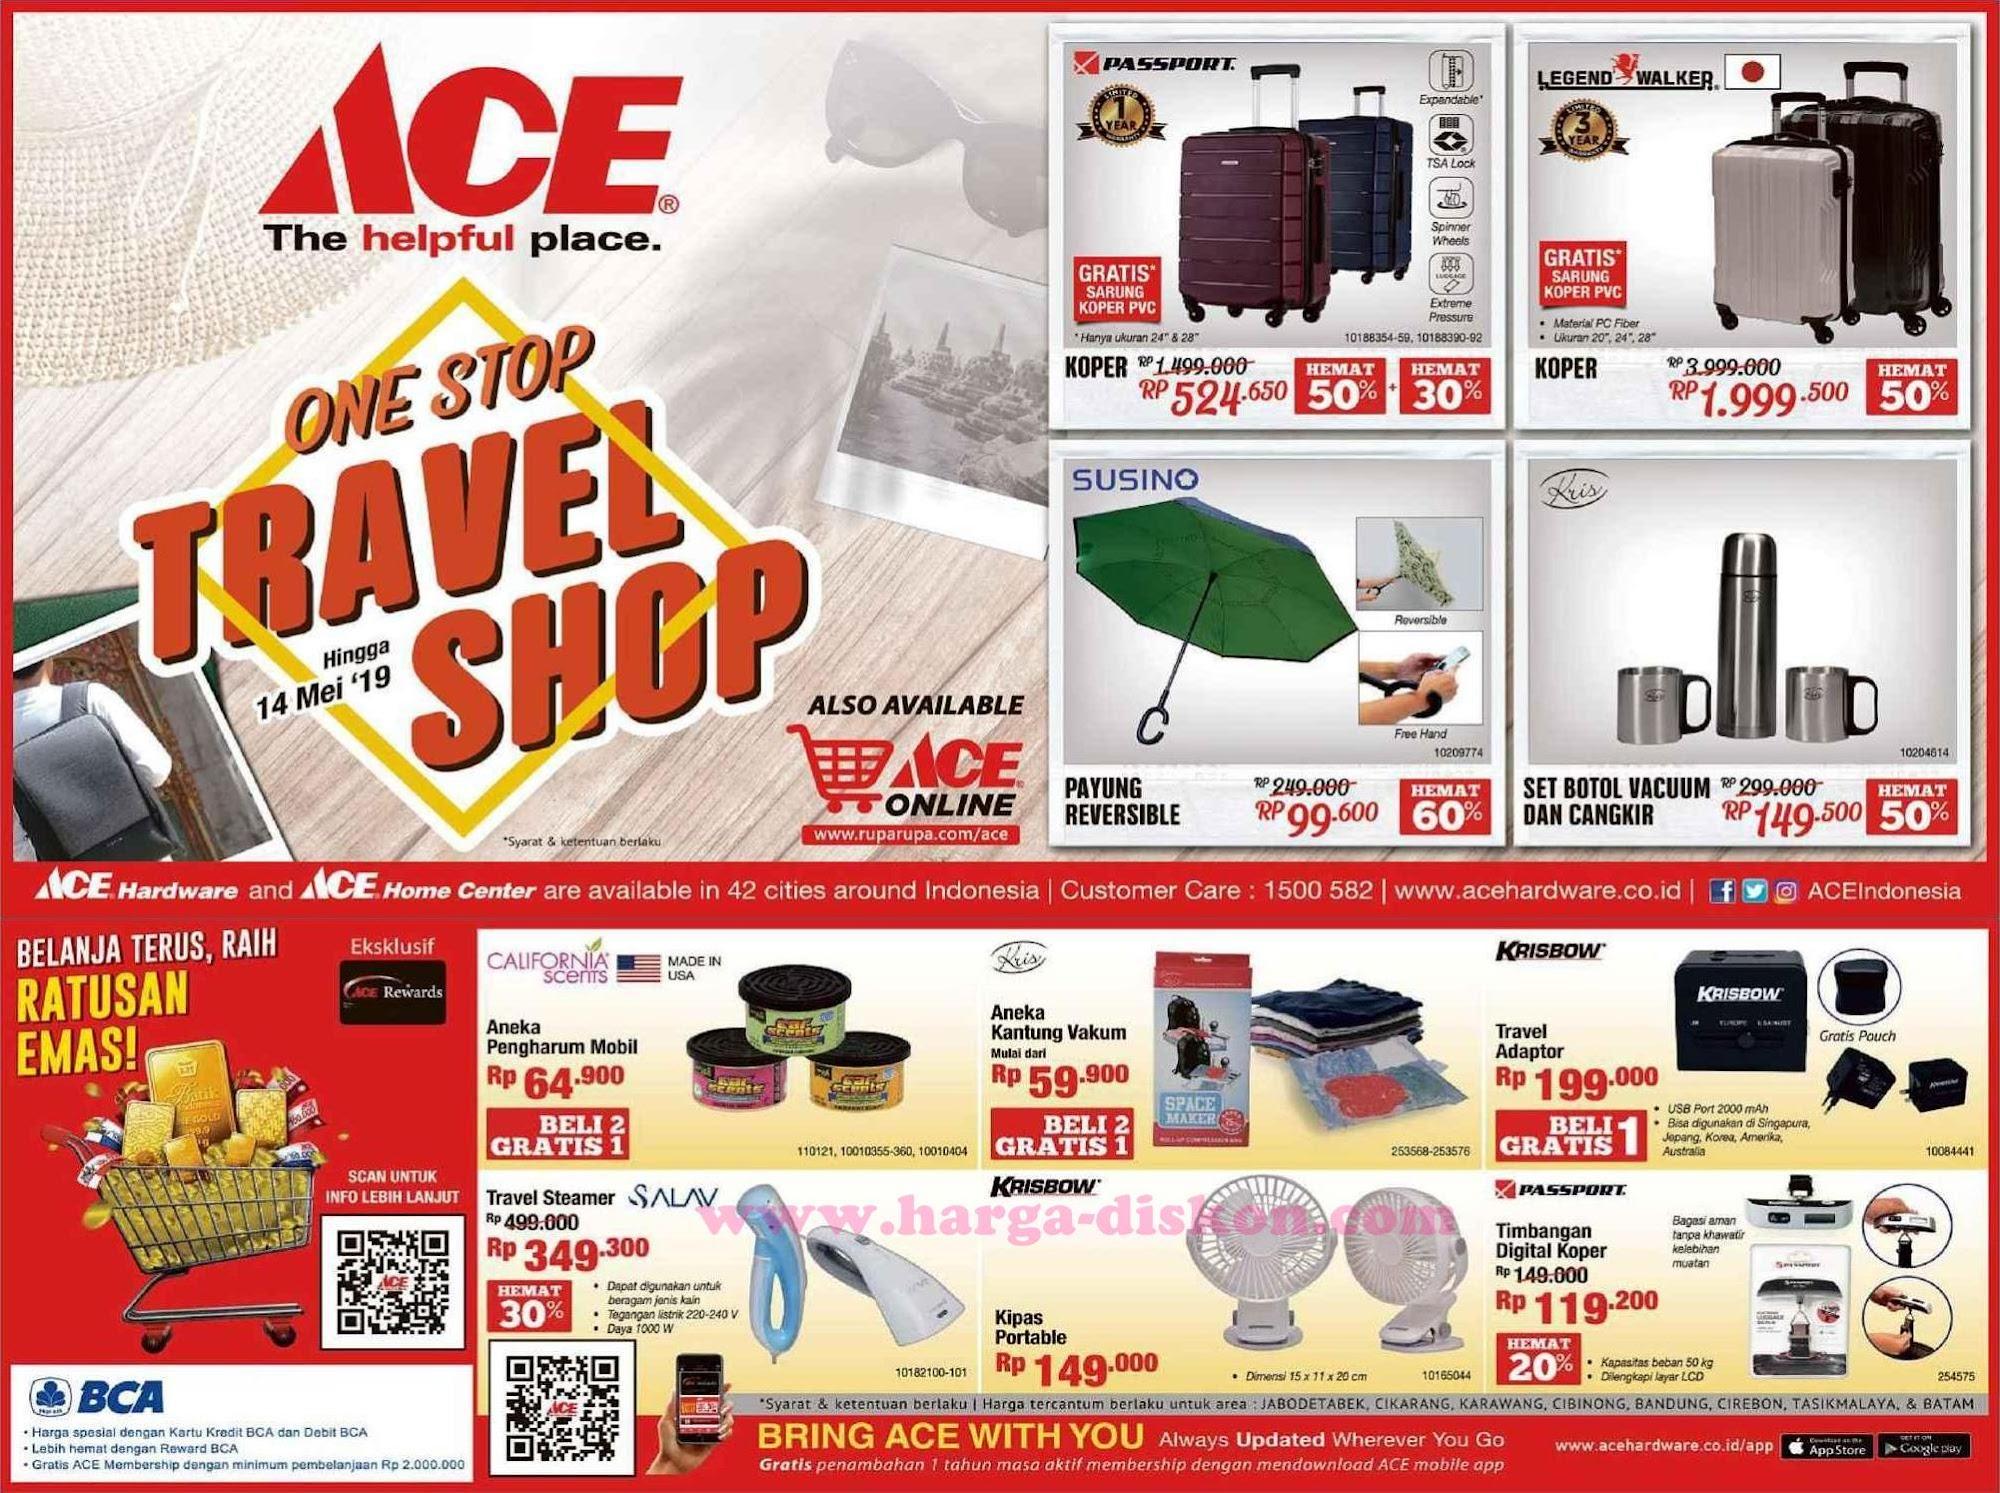 Promo Ace Hardware Terbaru Produk Perlengkapan Travel Hingga 14 Mei 2019 Harga Diskon